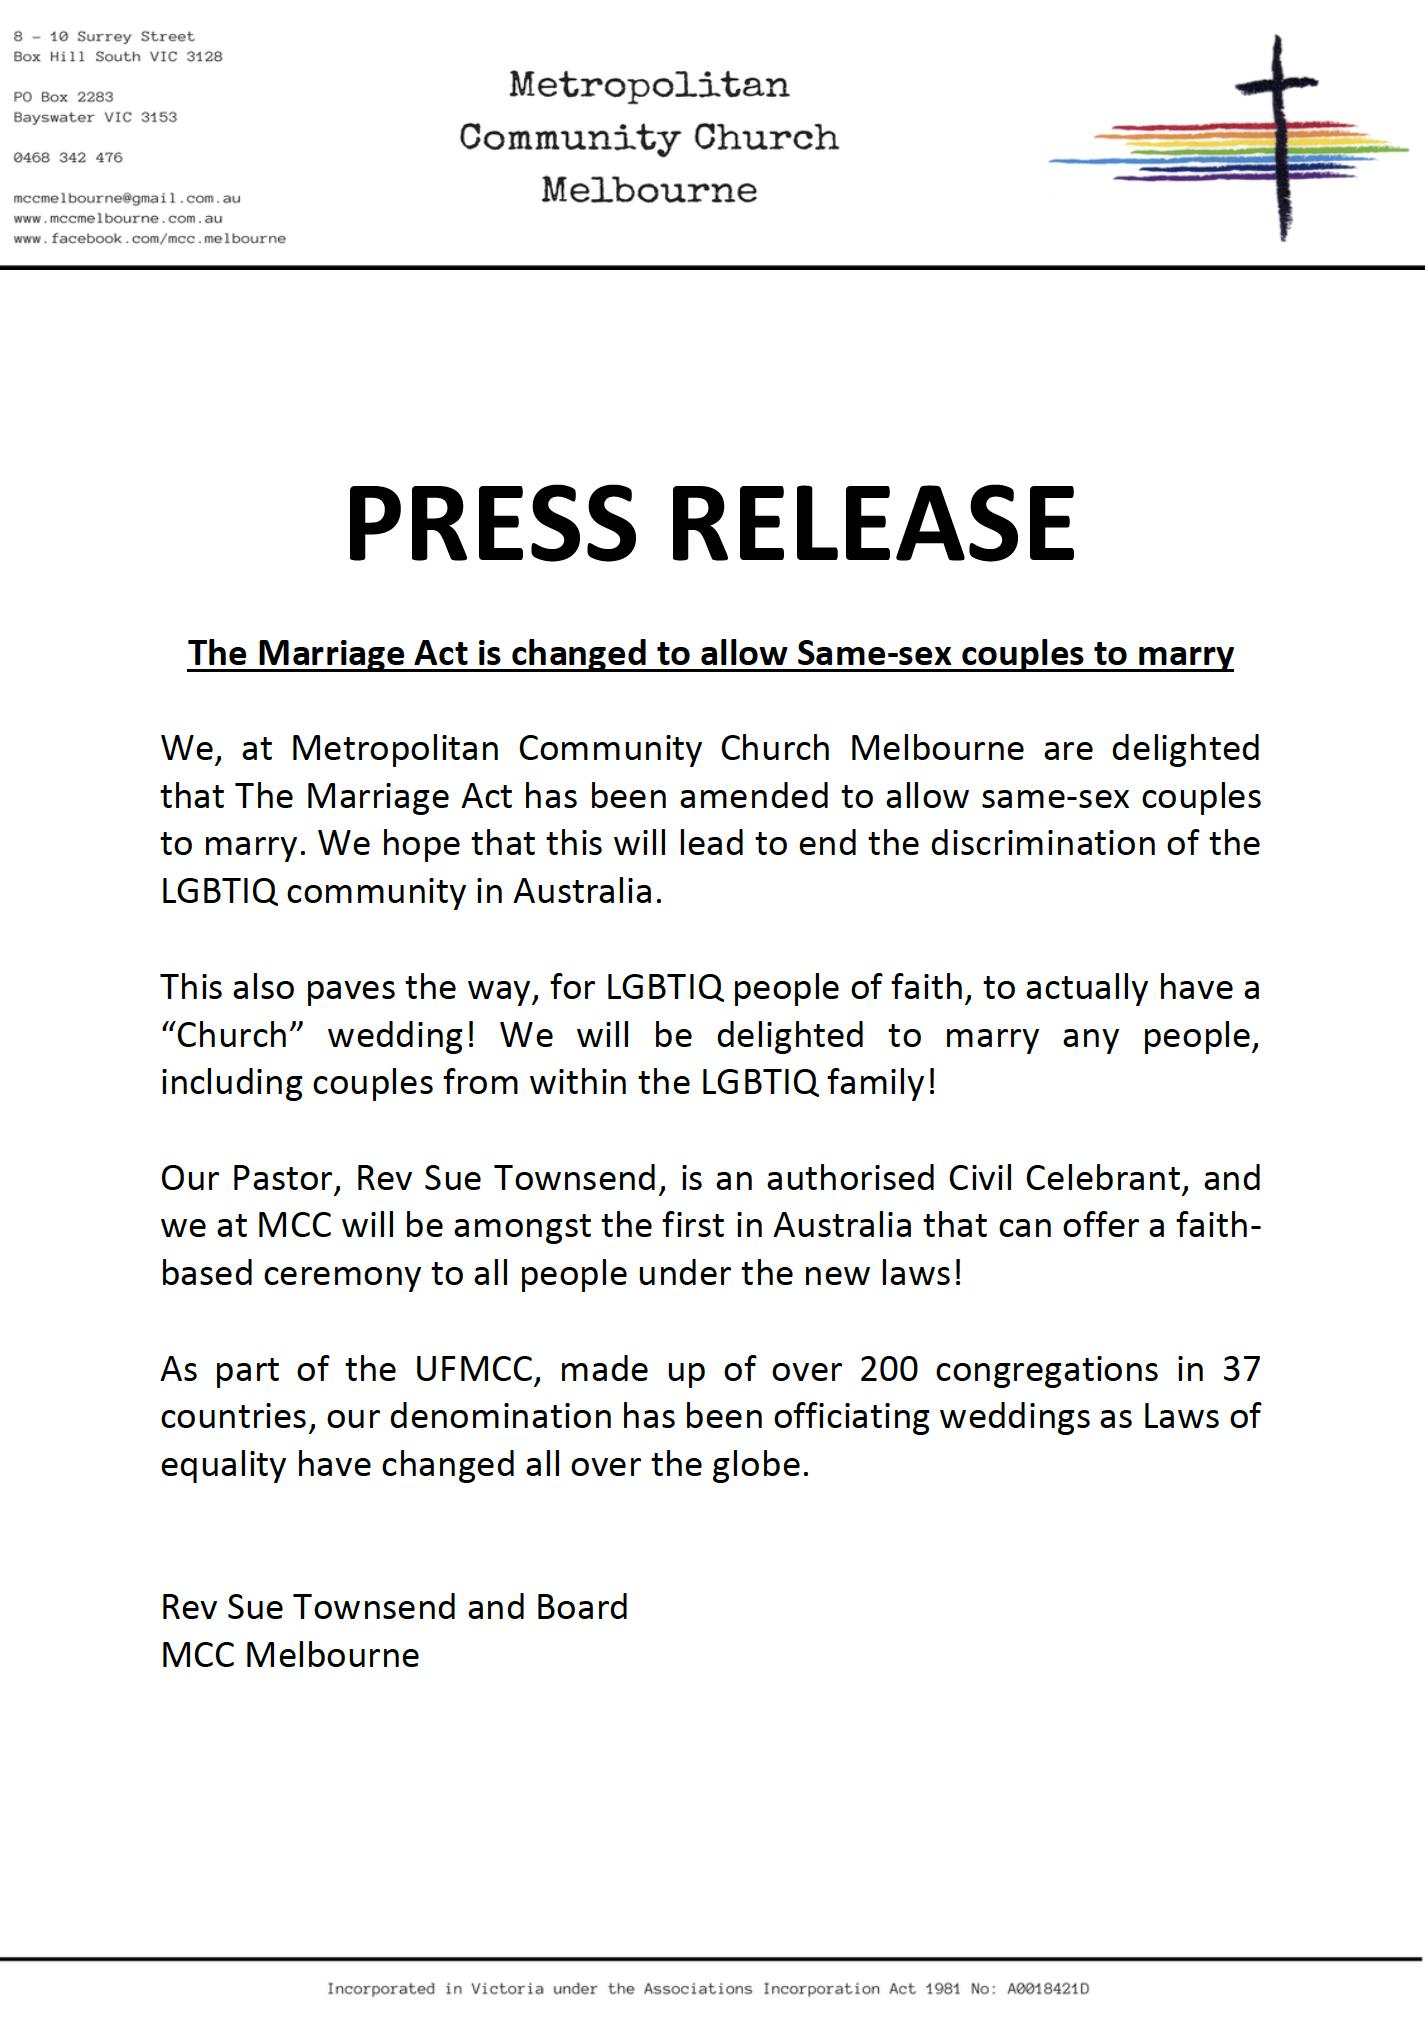 MCC Press Release.png